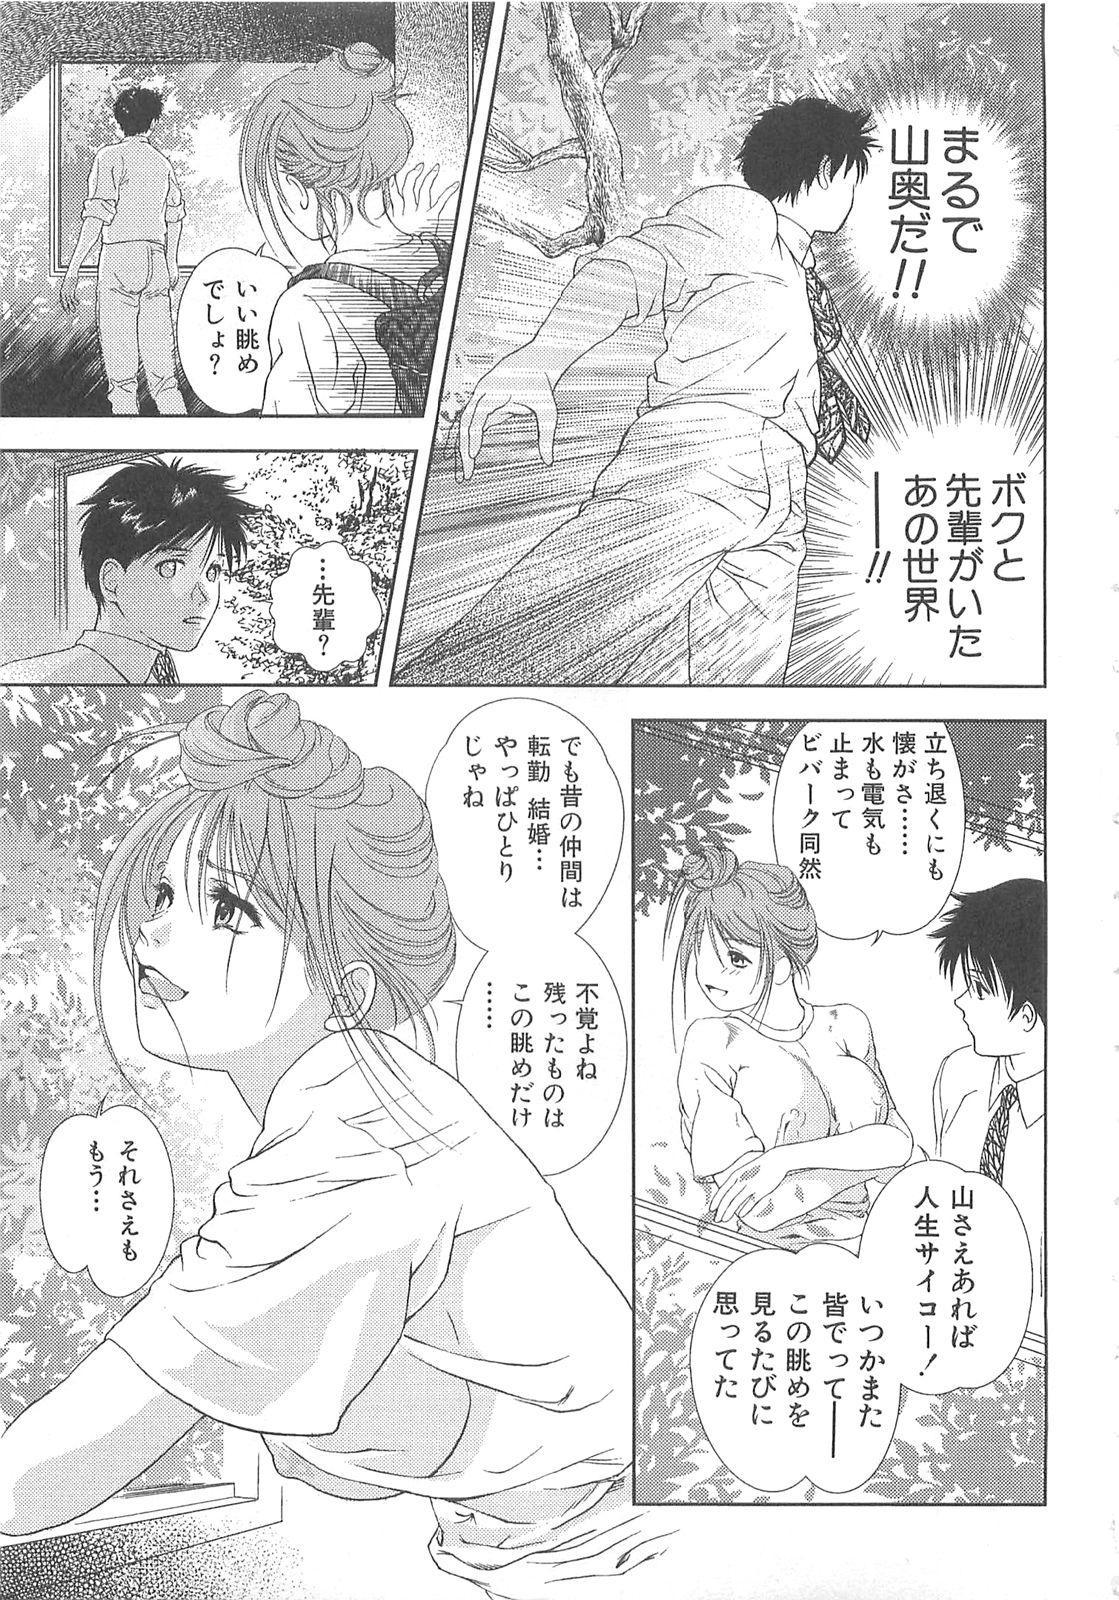 Tenshi no Kyuu - Angel's Pretty Hip 199